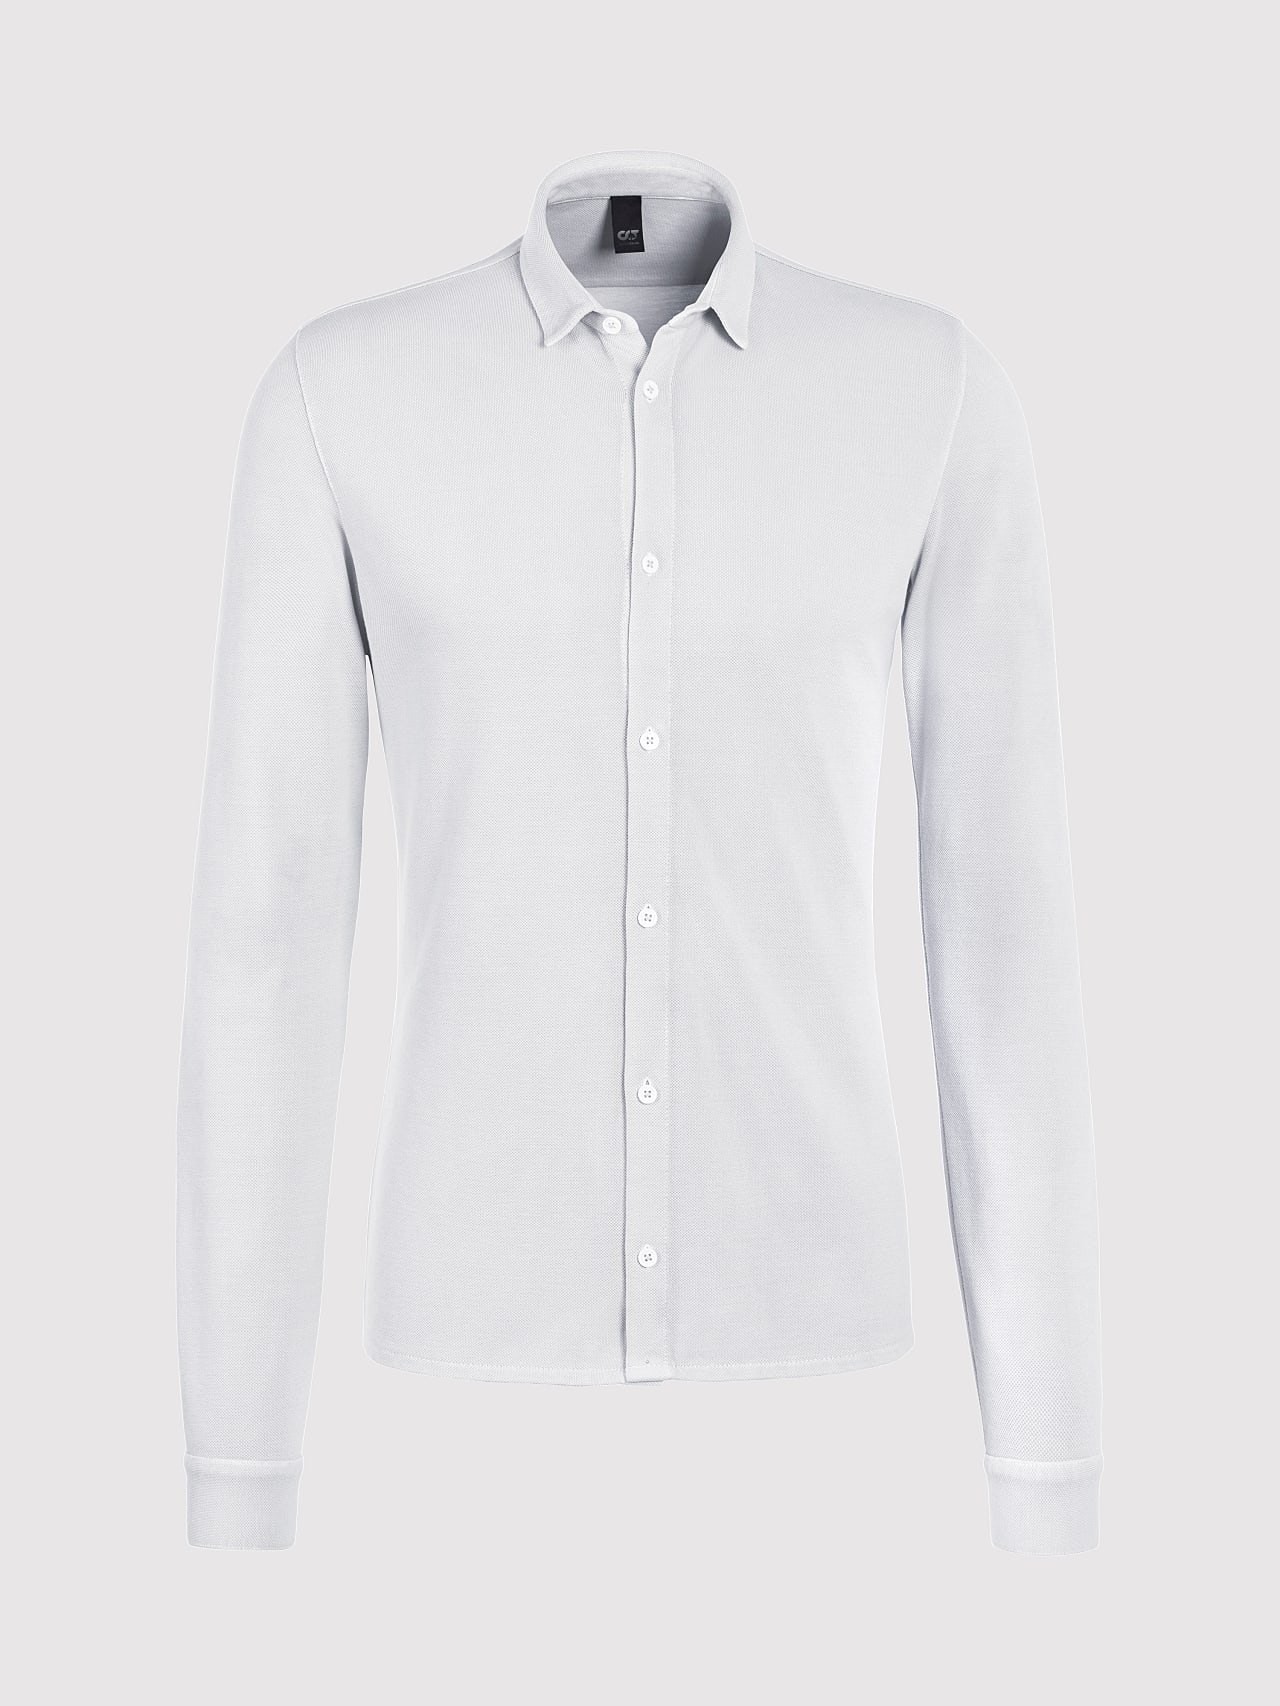 JIQUE V1.Y5.01 Pique Shirt with Kent Collar white Back Alpha Tauri